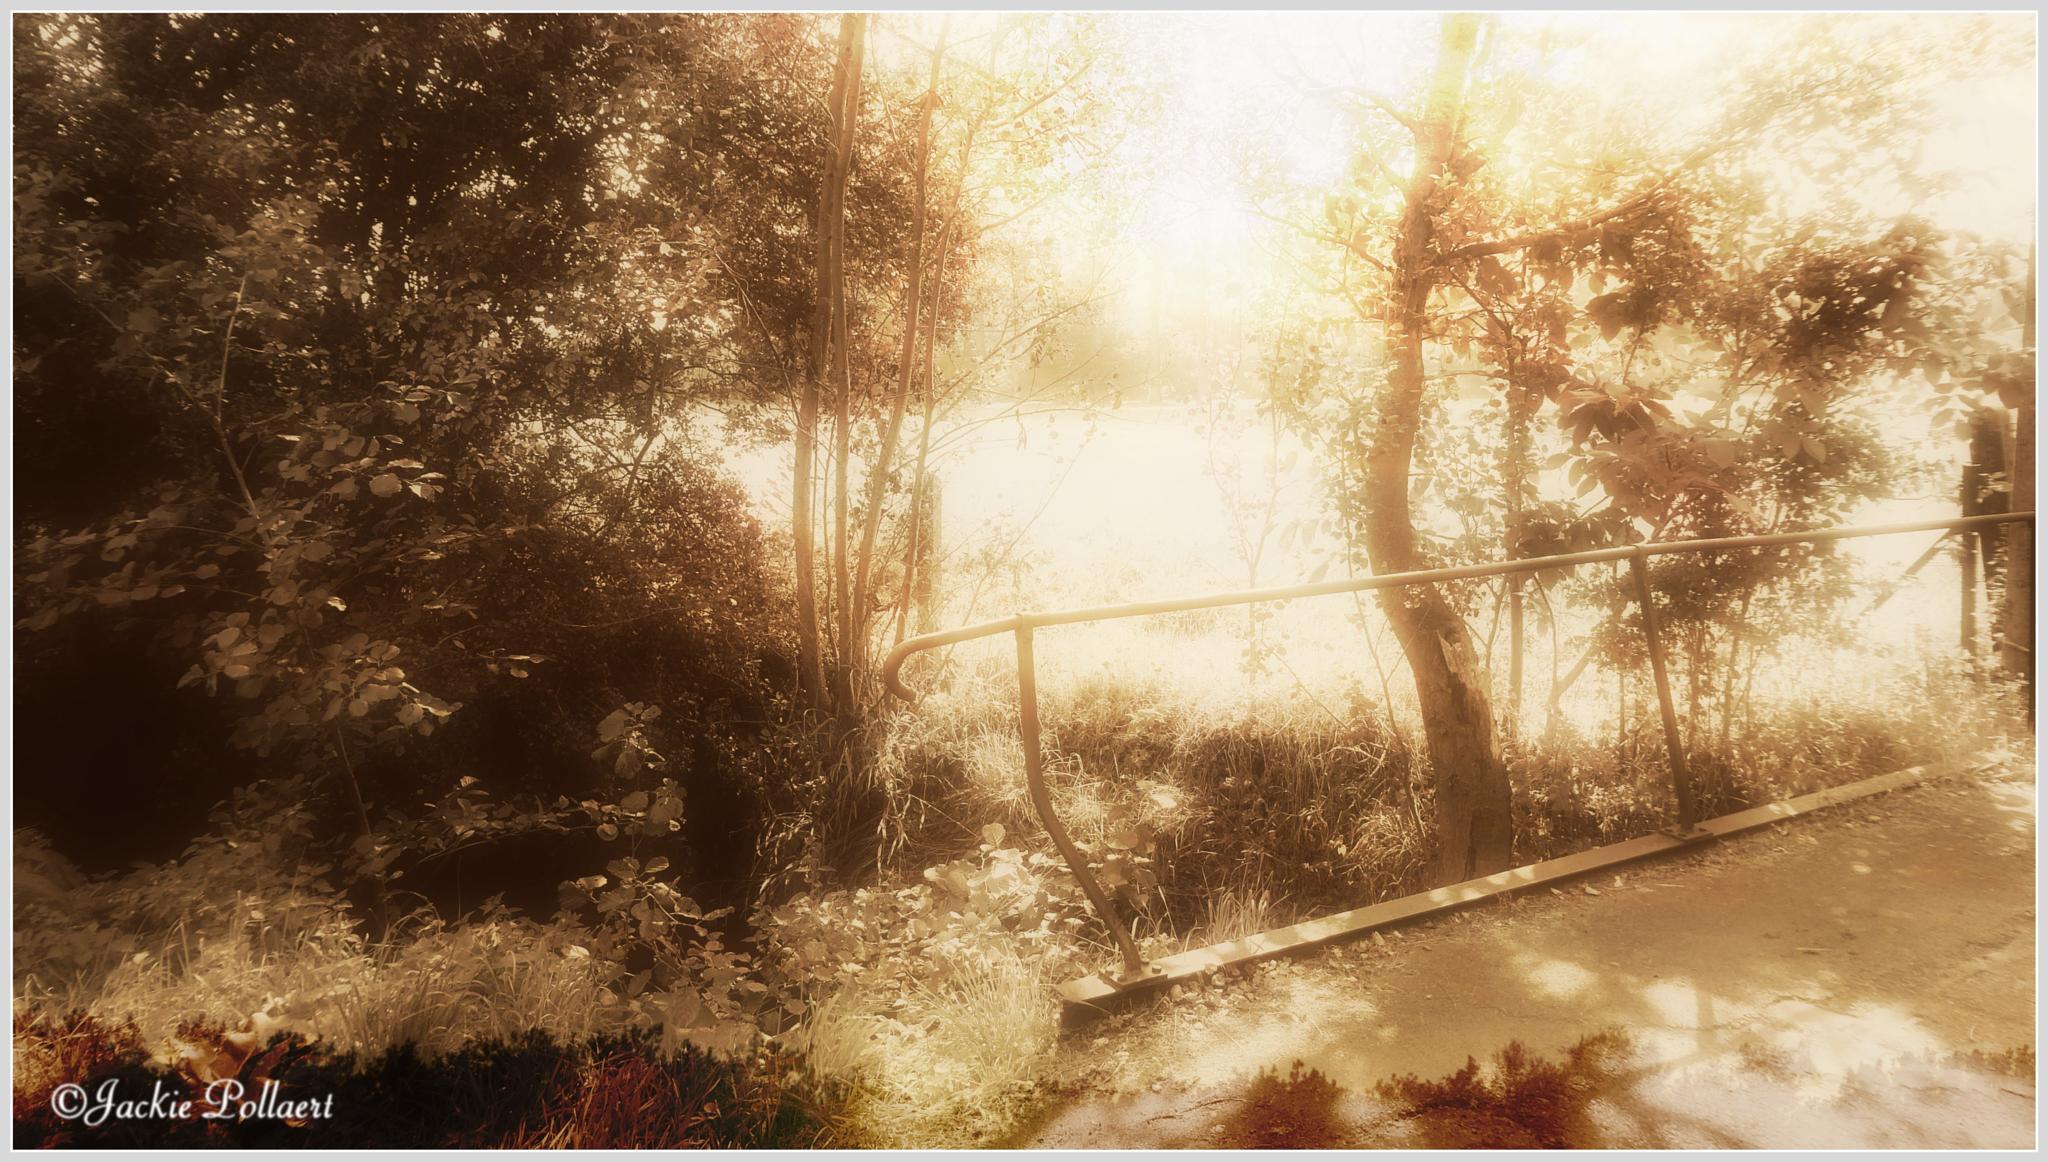 Le pont - The bridge by Jackie Pollaert